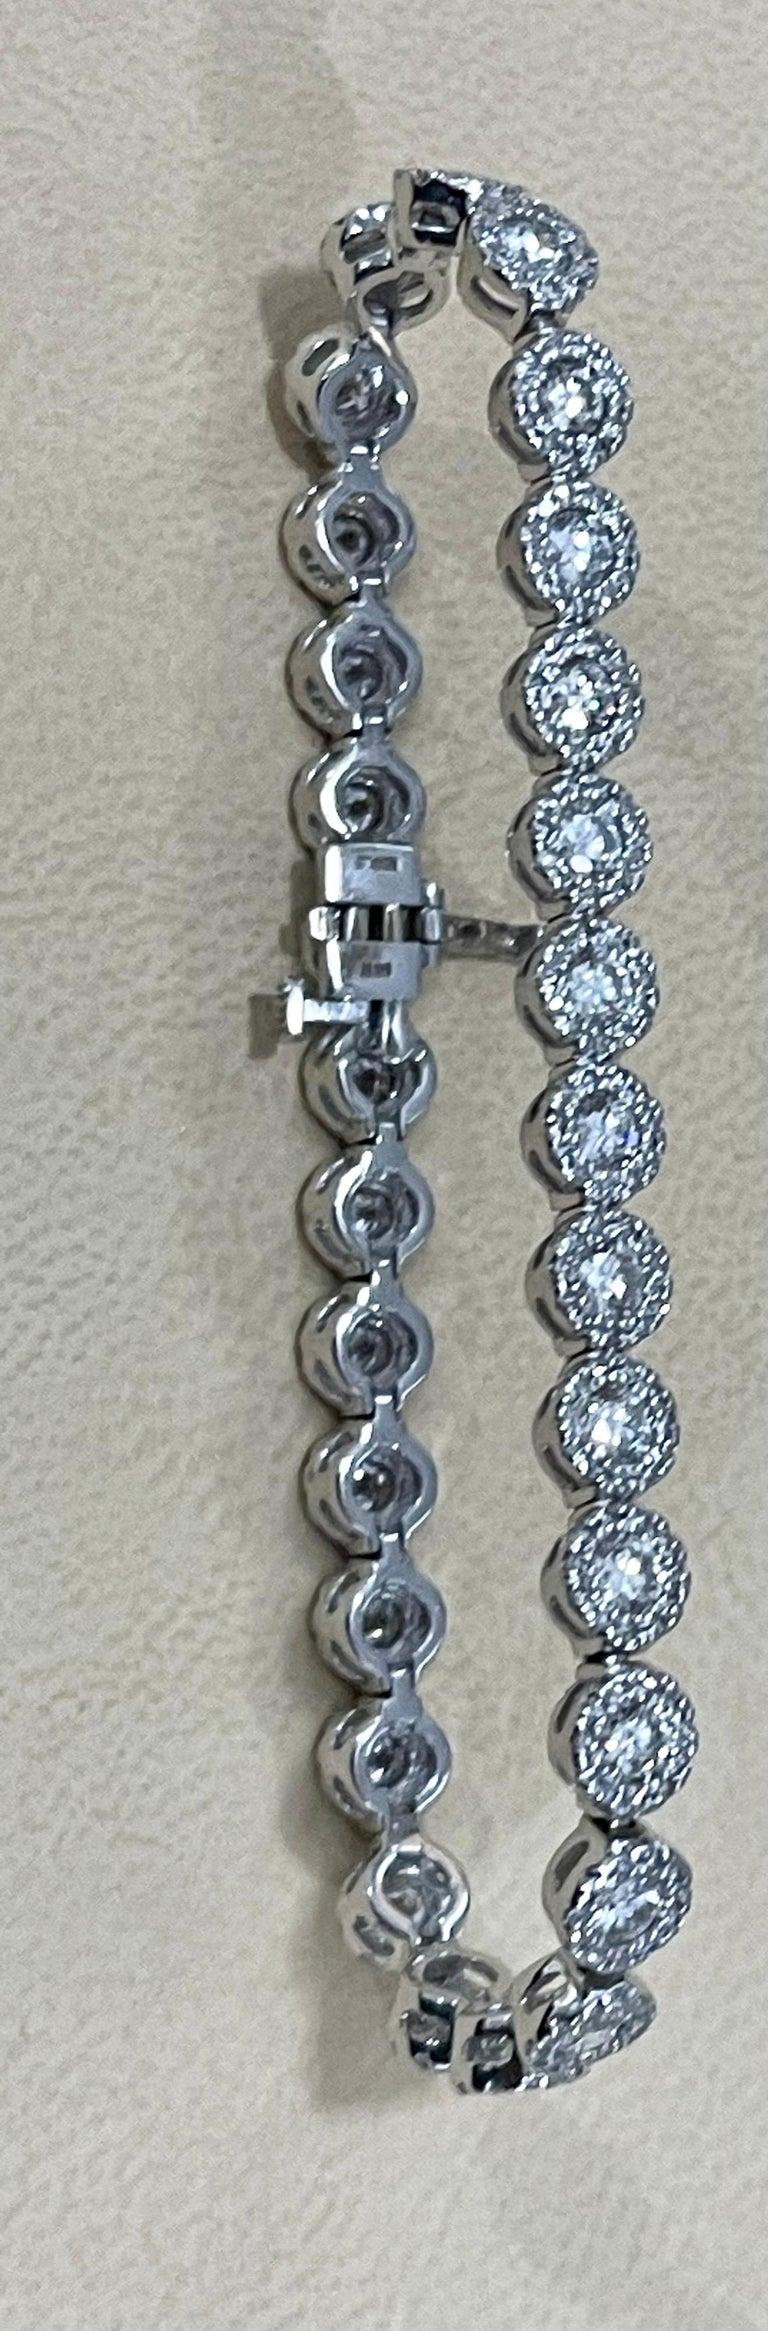 Effy's 5.5 Carat Basel Set Diamond Line Tennis Bracelet in 14 Karat White Gold For Sale 6